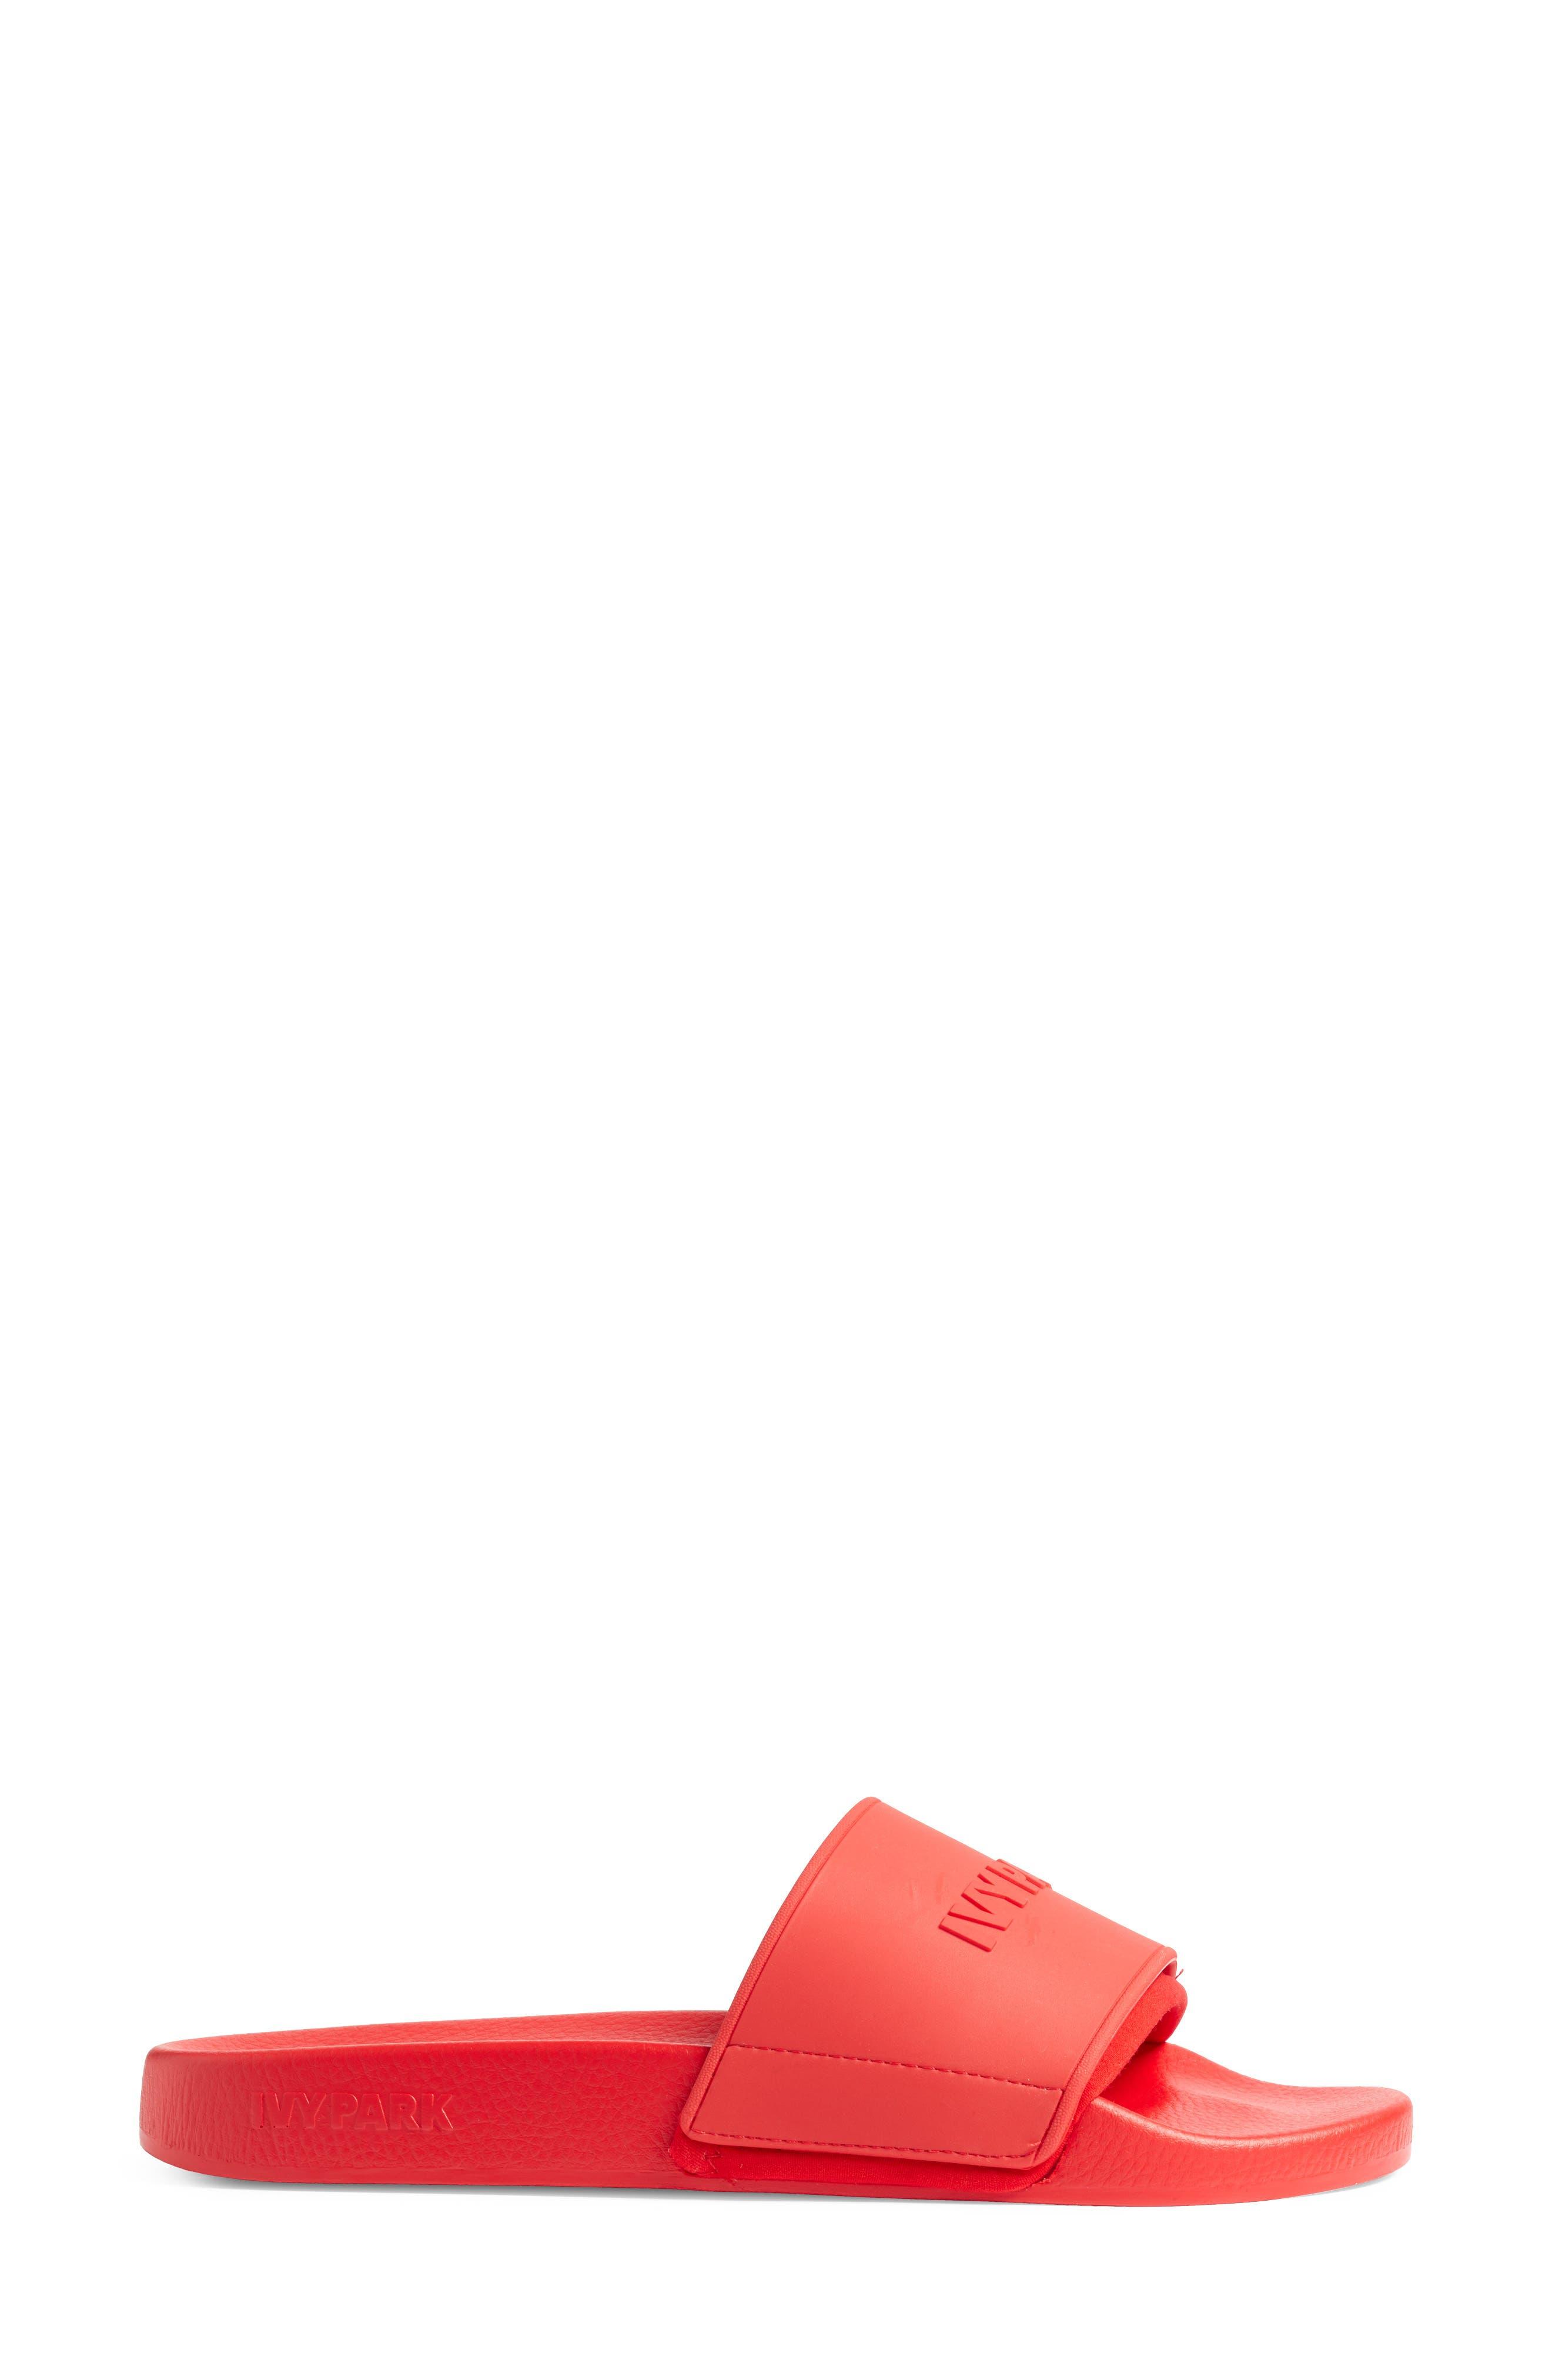 IVY PARK<SUP>®</SUP>, Embossed Logo Slide Sandal, Alternate thumbnail 3, color, 600